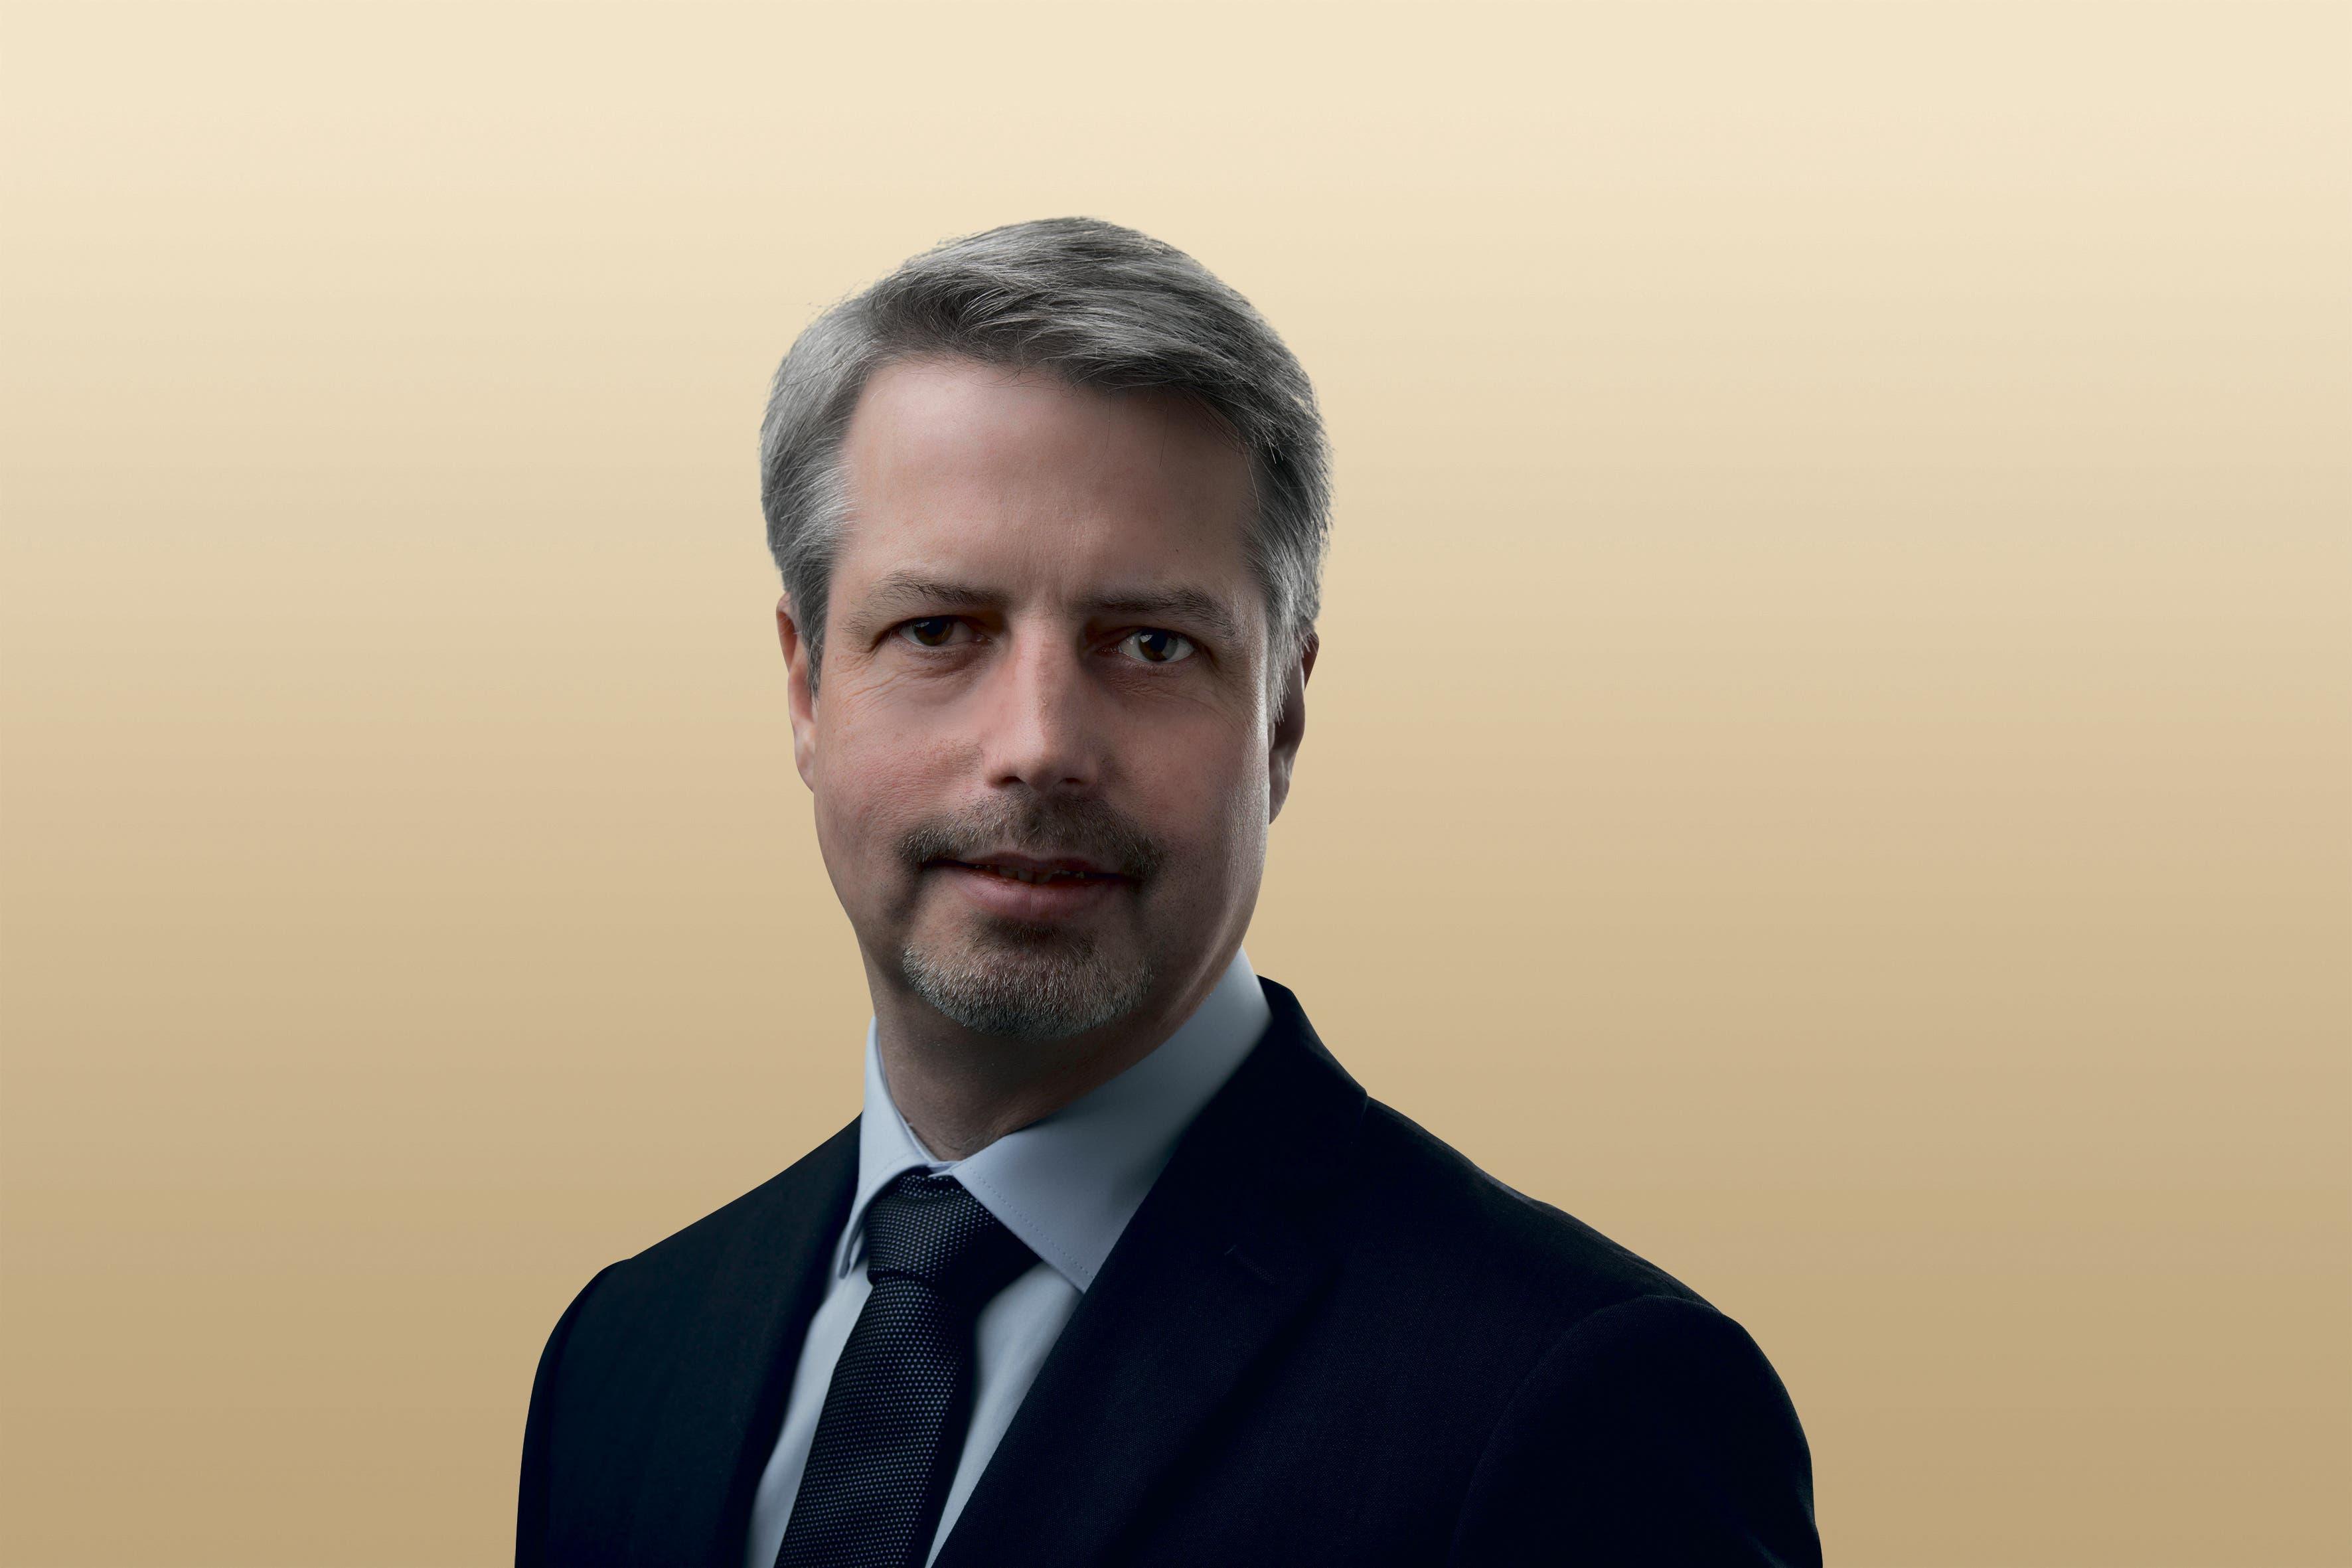 Kurt Gisler, CVP, 1971, Elektroingenieur, seit 2016